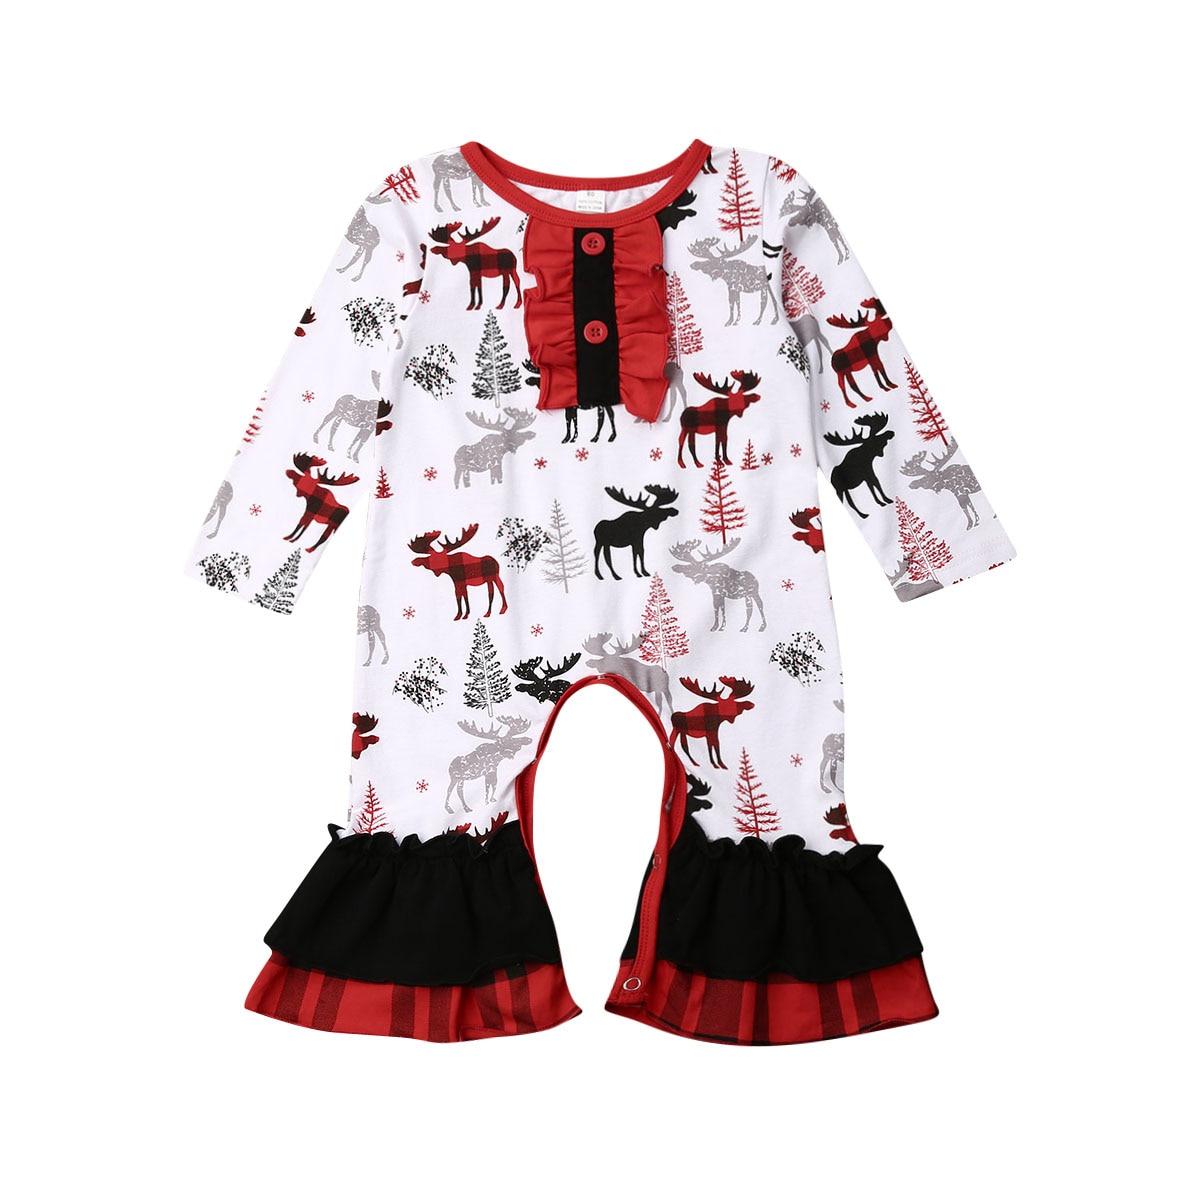 Navidad recién nacido niña Reno estampado manga larga volantes ropa mameluco mono trajes 0-24M